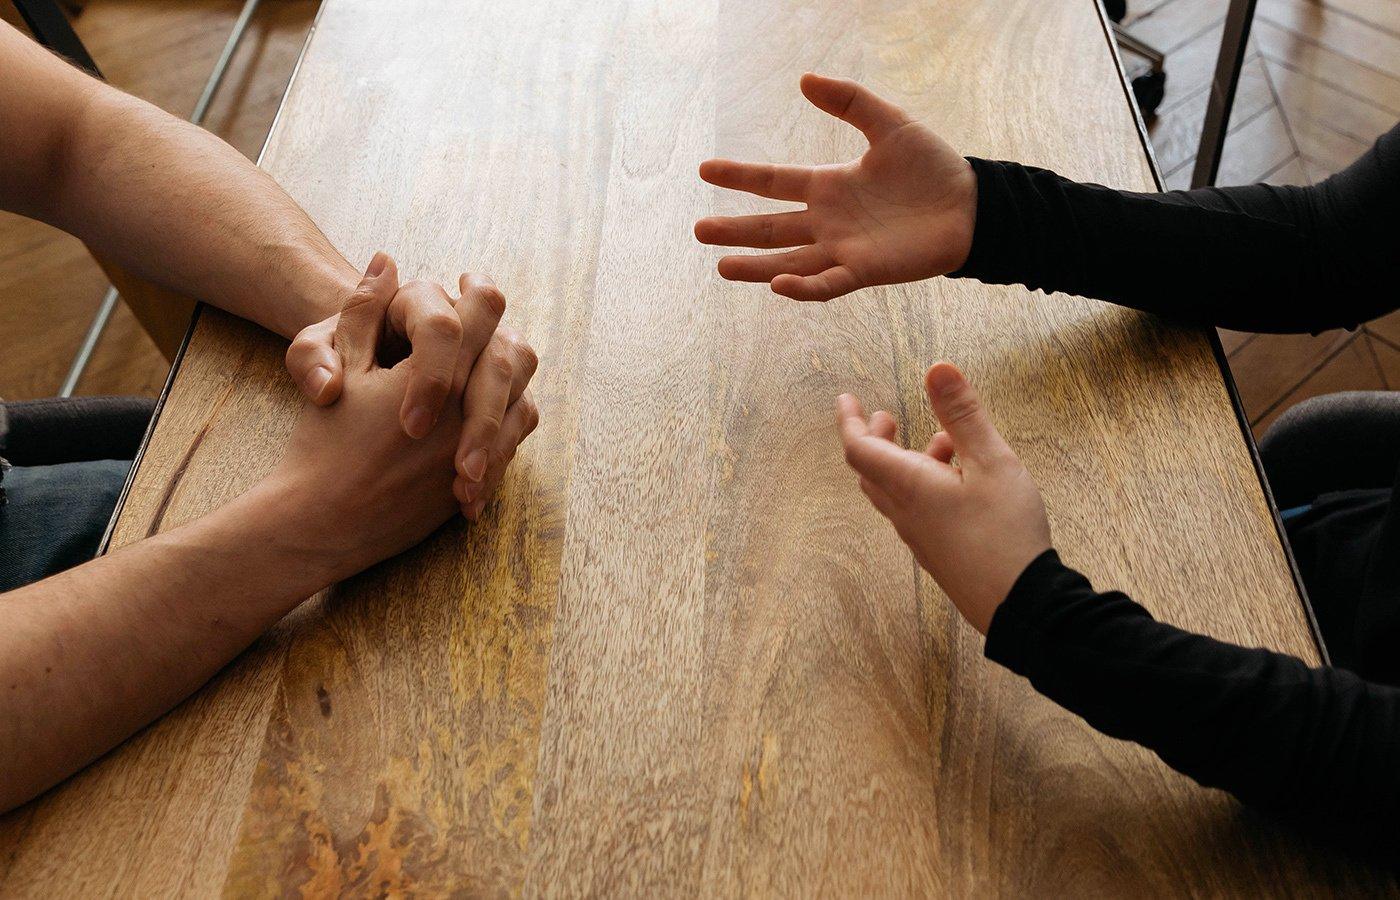 Entretien d'embauche : demander un feedback après un refus